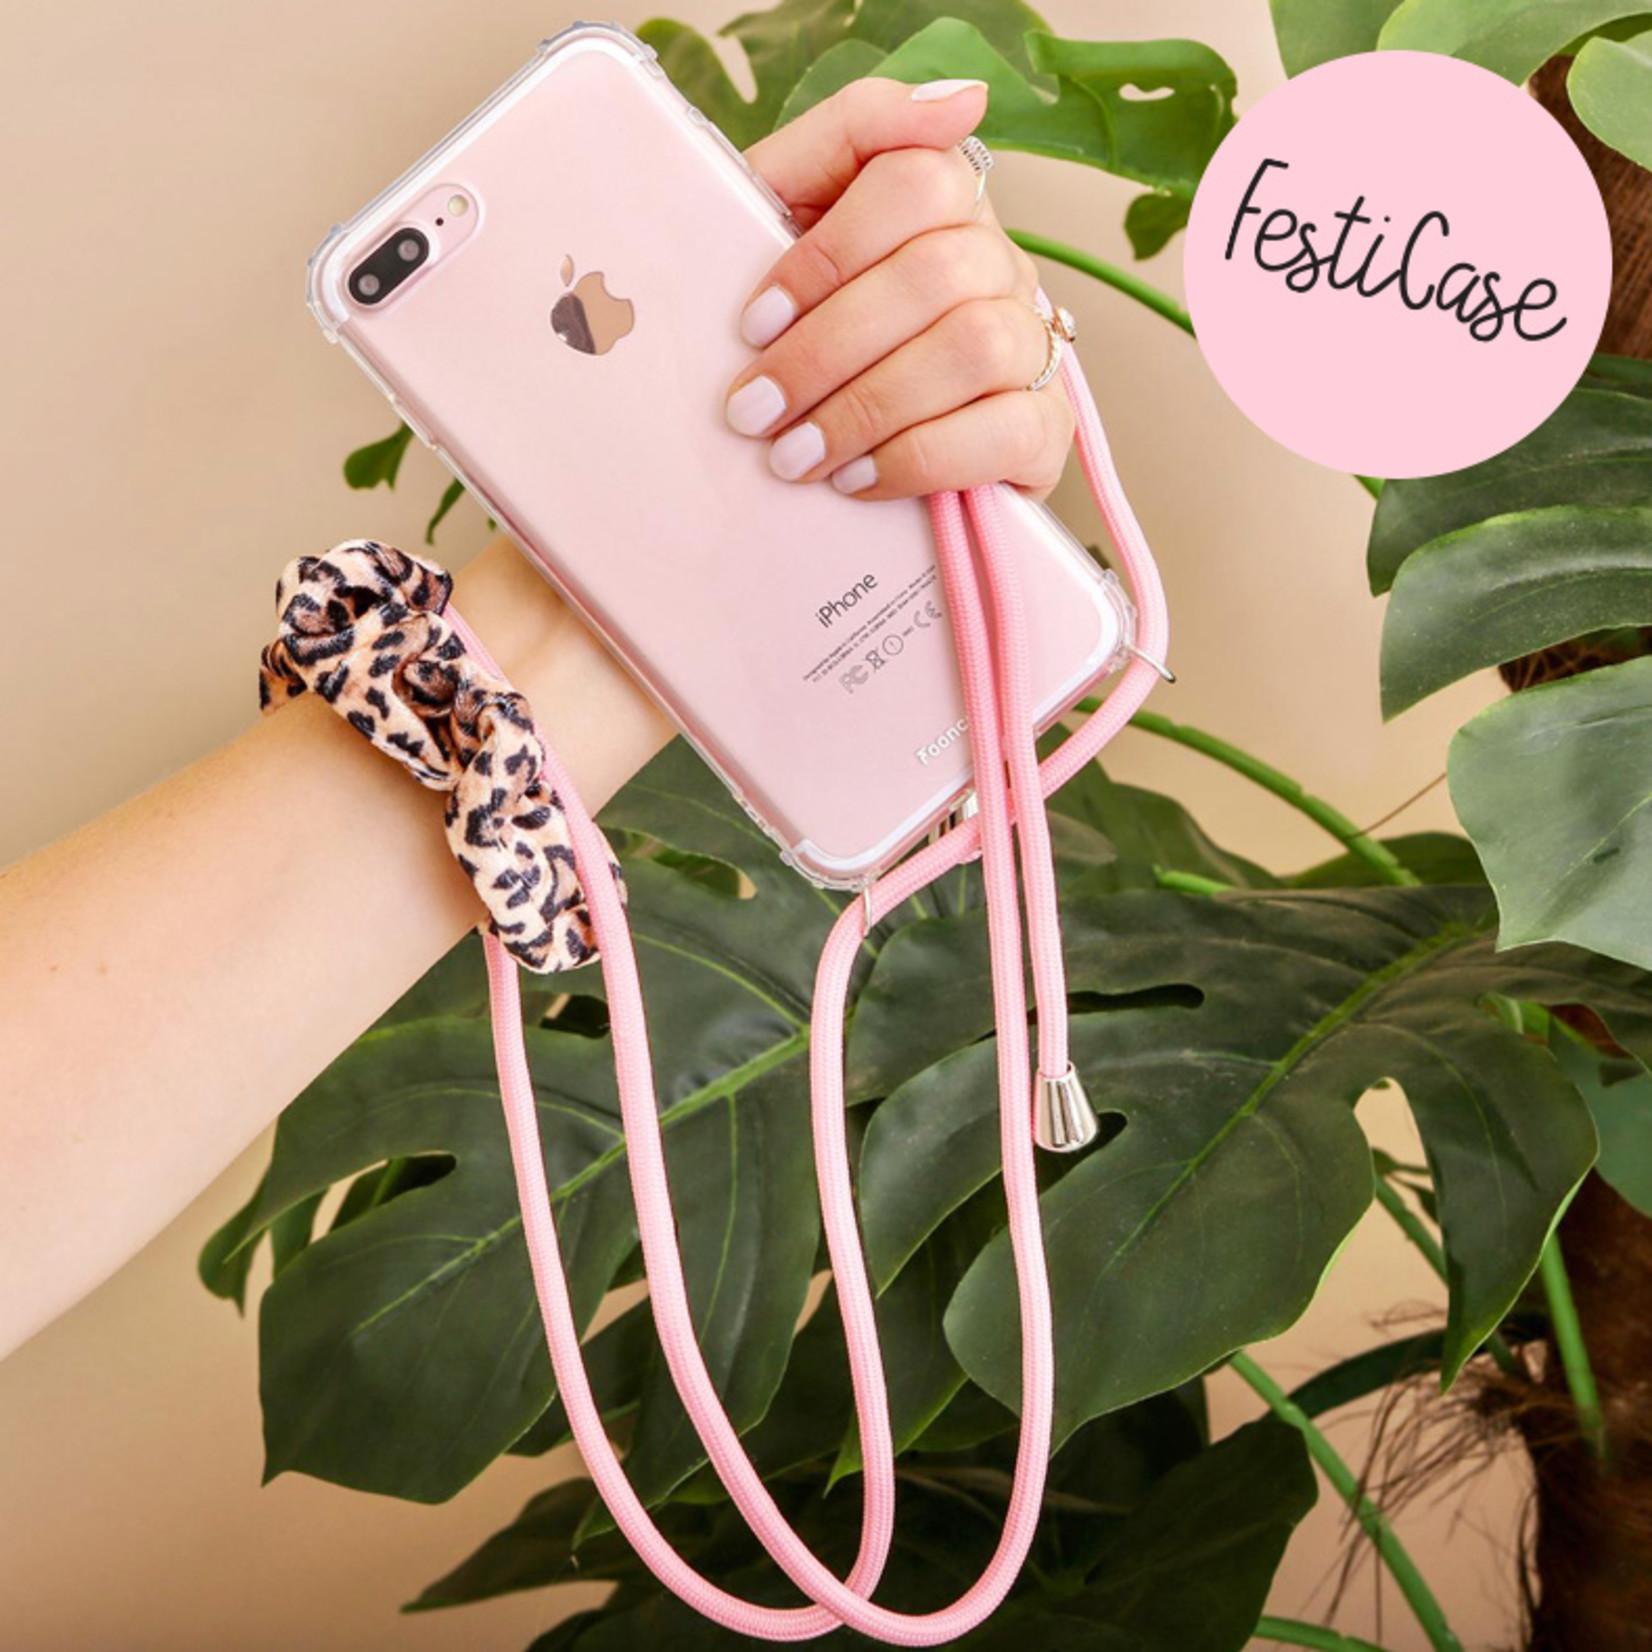 FOONCASE FESTICASE iPhone 7 Telefoonhoesje met koord (Roze) TPU Soft Case - Transparant